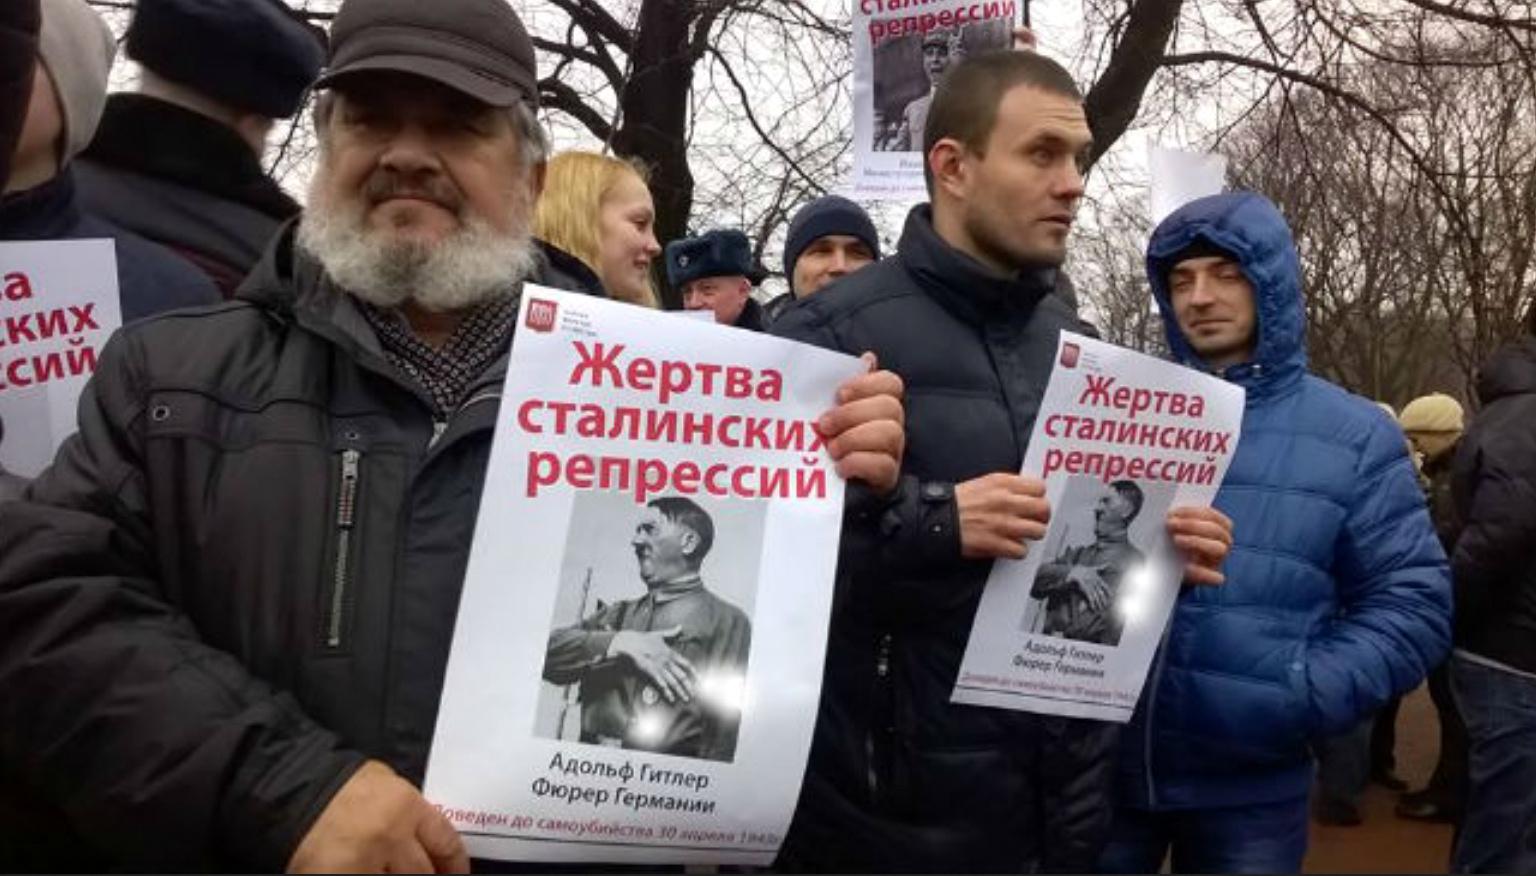 zhertva-stalinskih-repressii-gitler